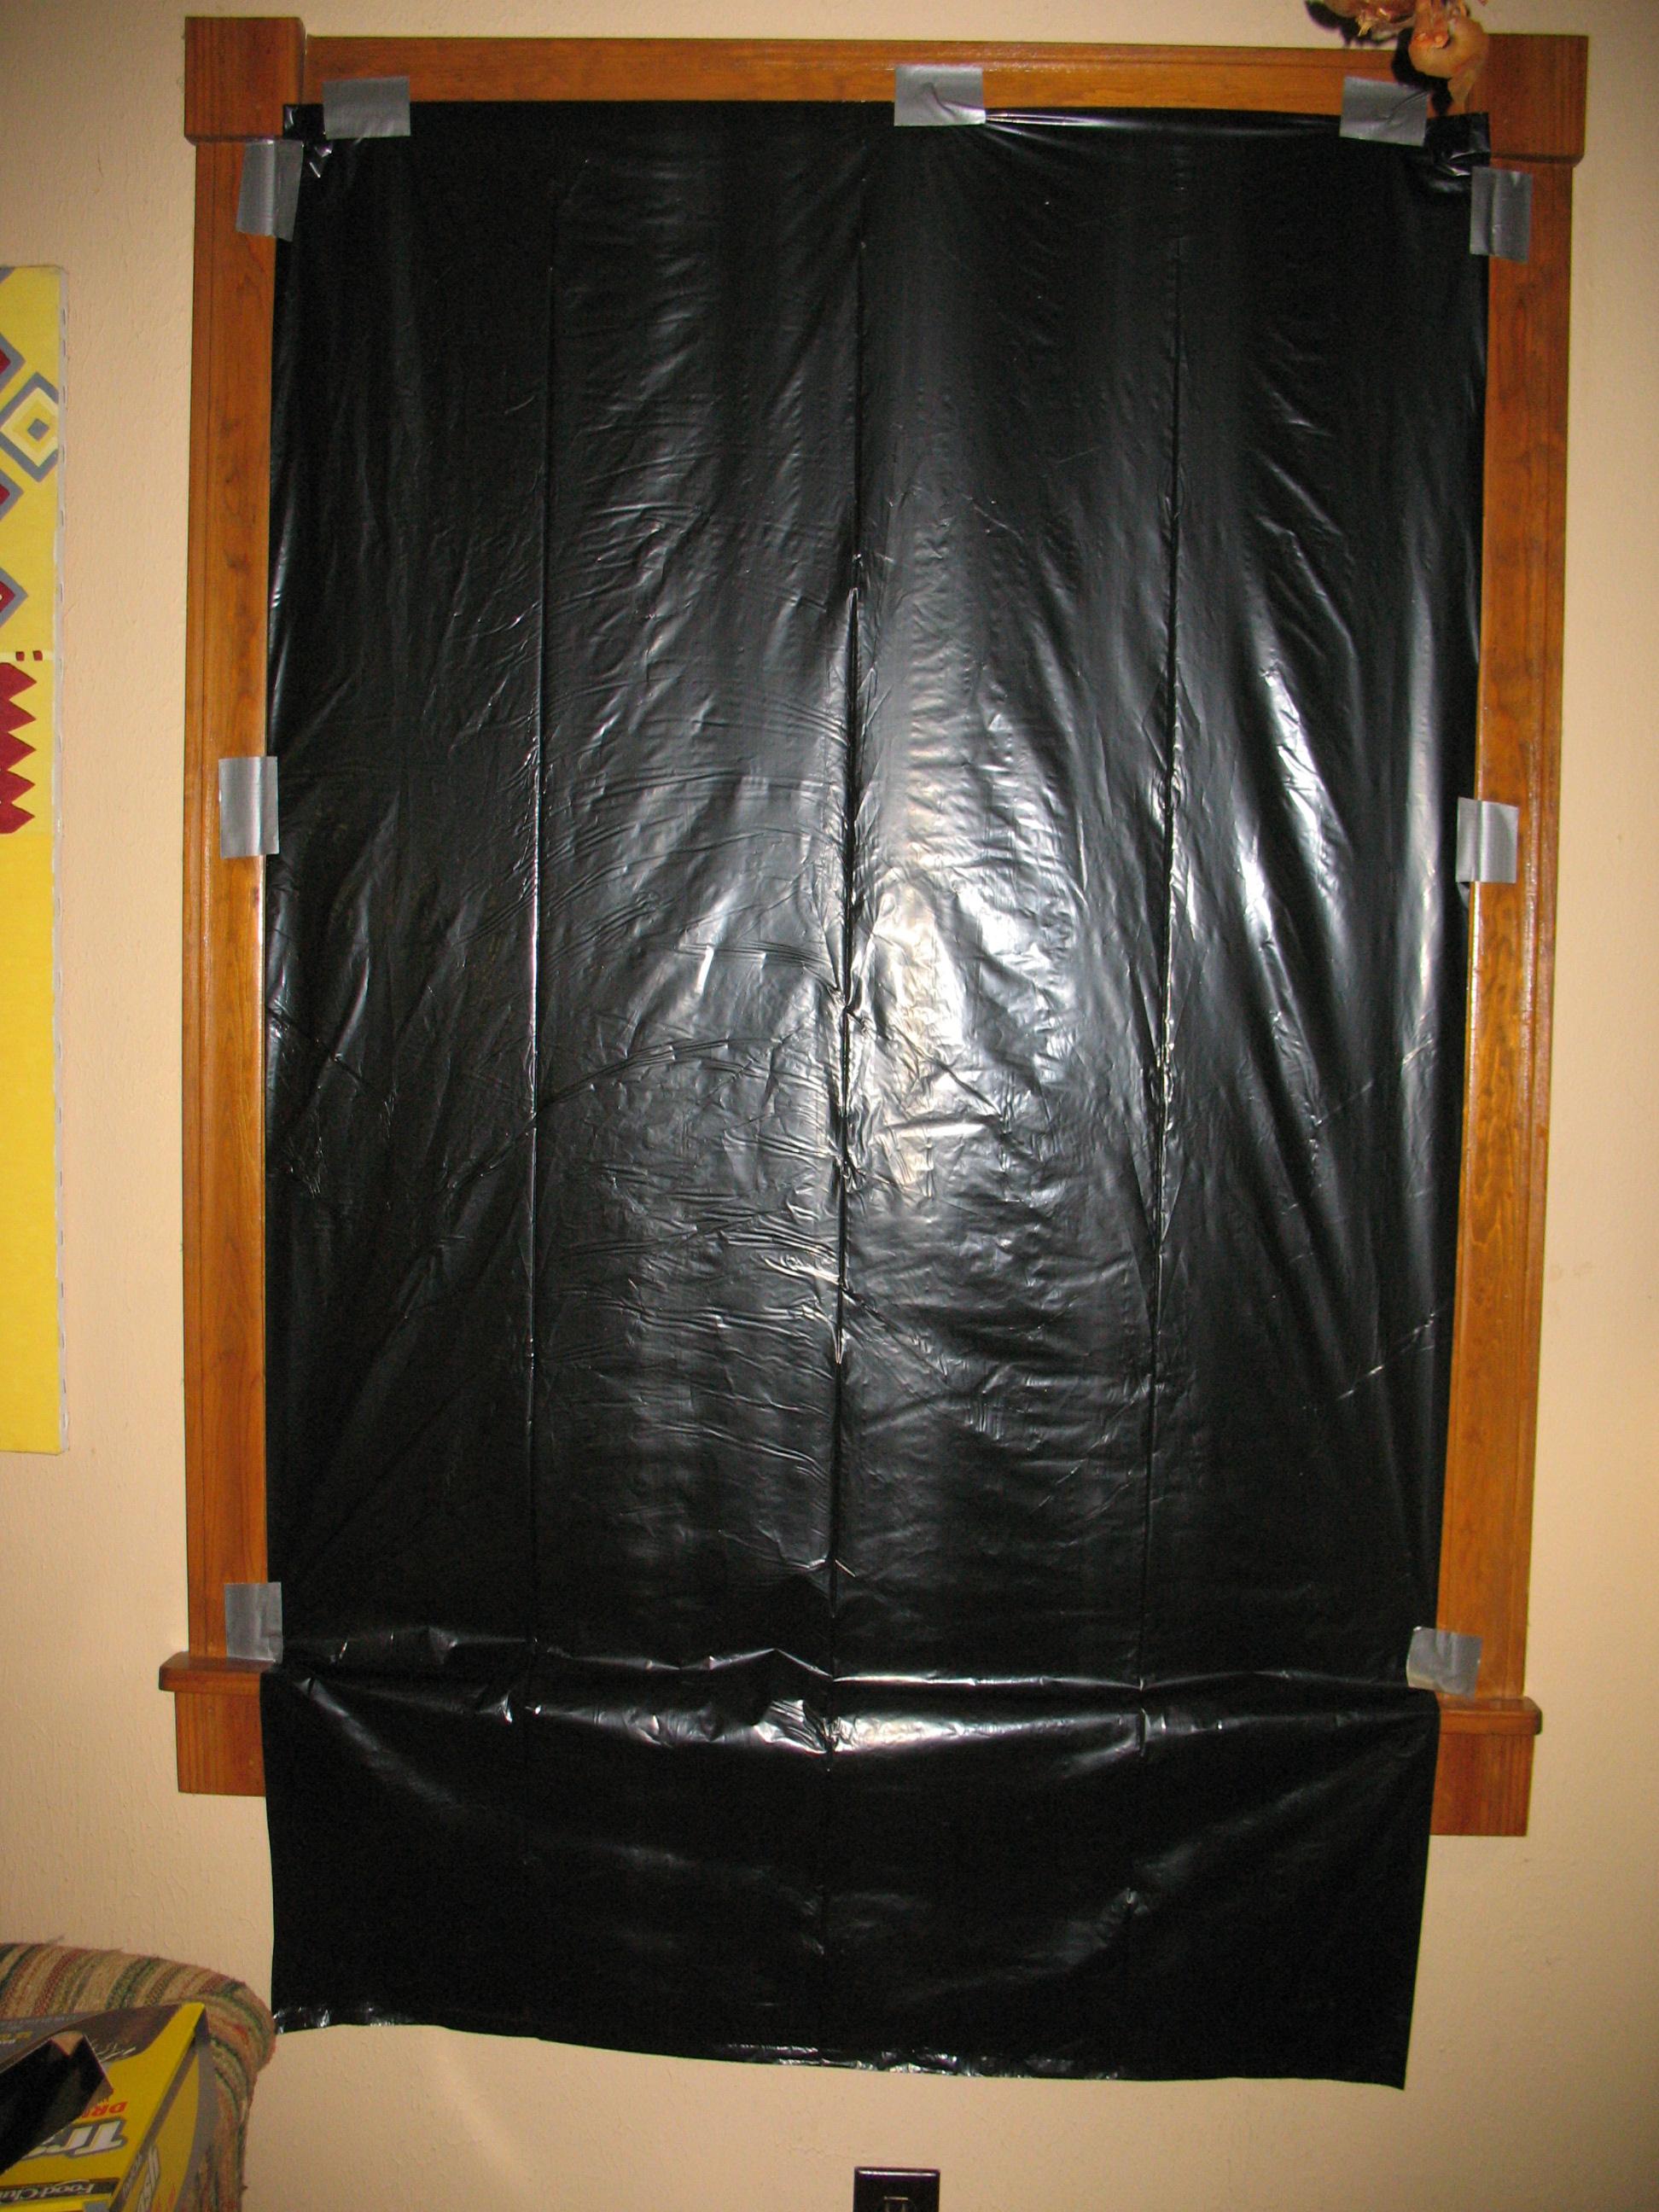 home security blackout curtains sensible survival. Black Bedroom Furniture Sets. Home Design Ideas